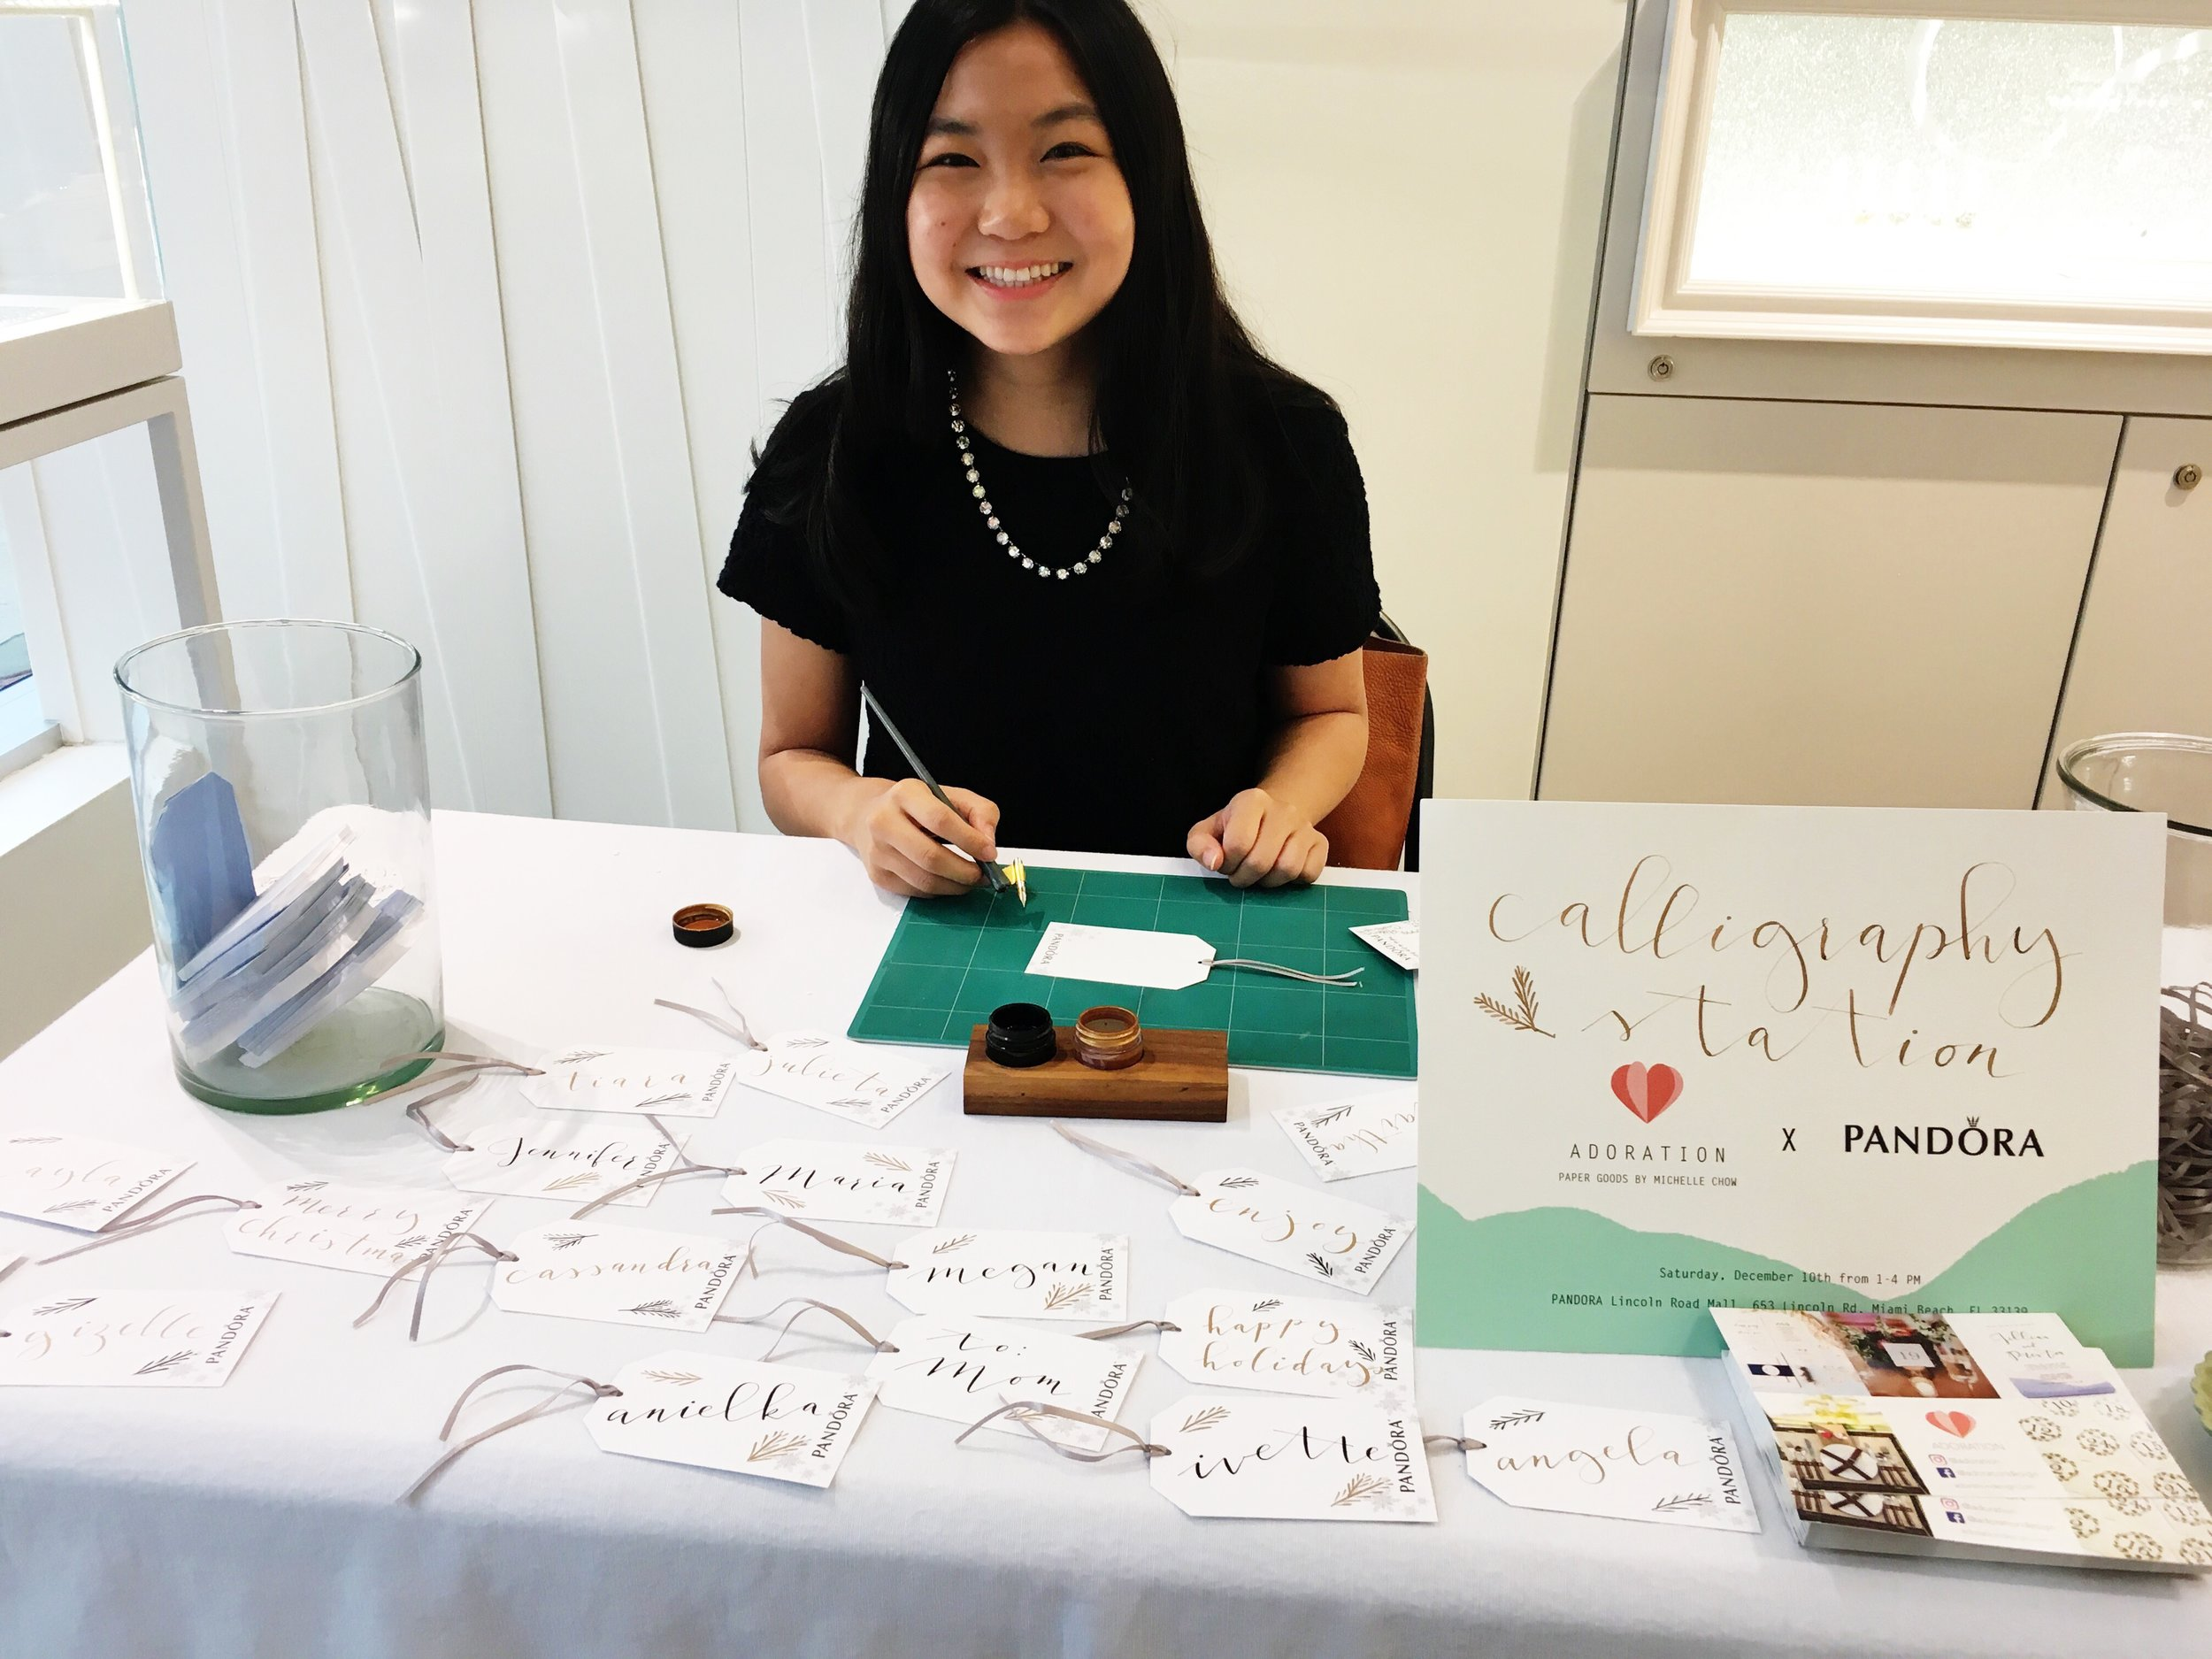 PANDORA Calligraphy Station 2016